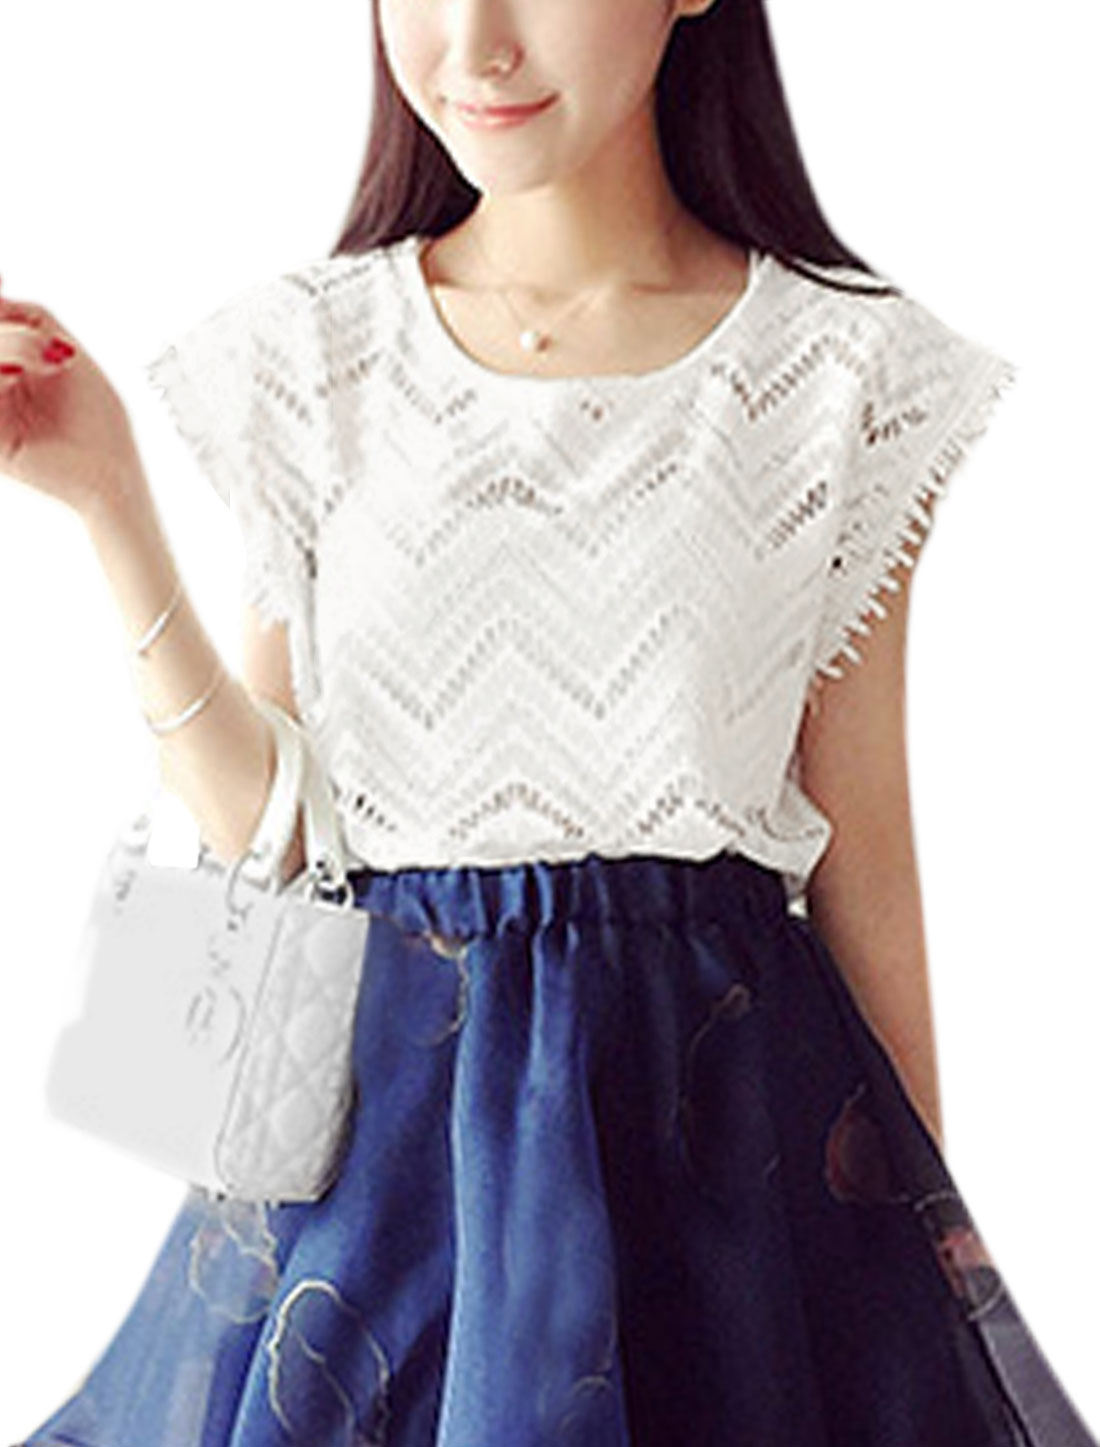 Women Cap Sleeves Panel Design Semi Sheer Casual Top White XS